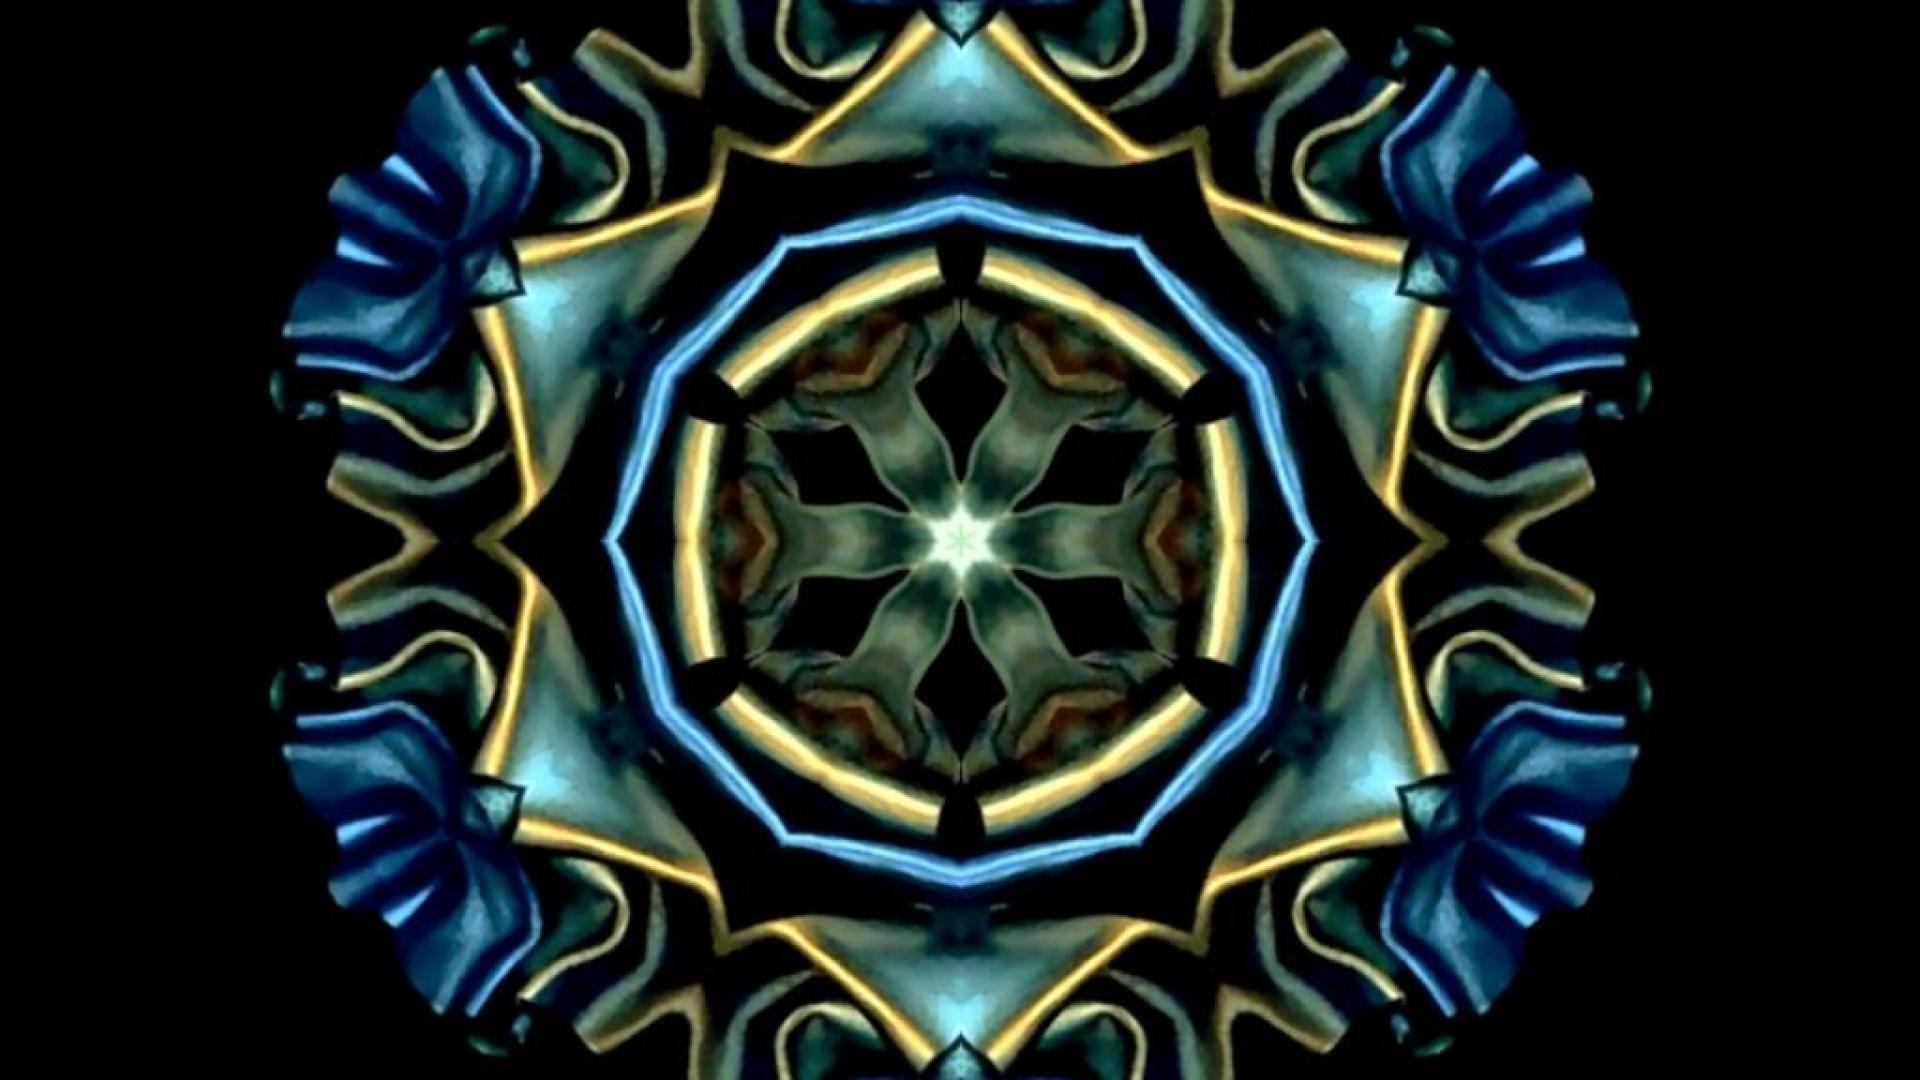 BLUE MANDALA WALLPAPER   43507   HD Wallpapers   [wallpapersinhqpw 1920x1080